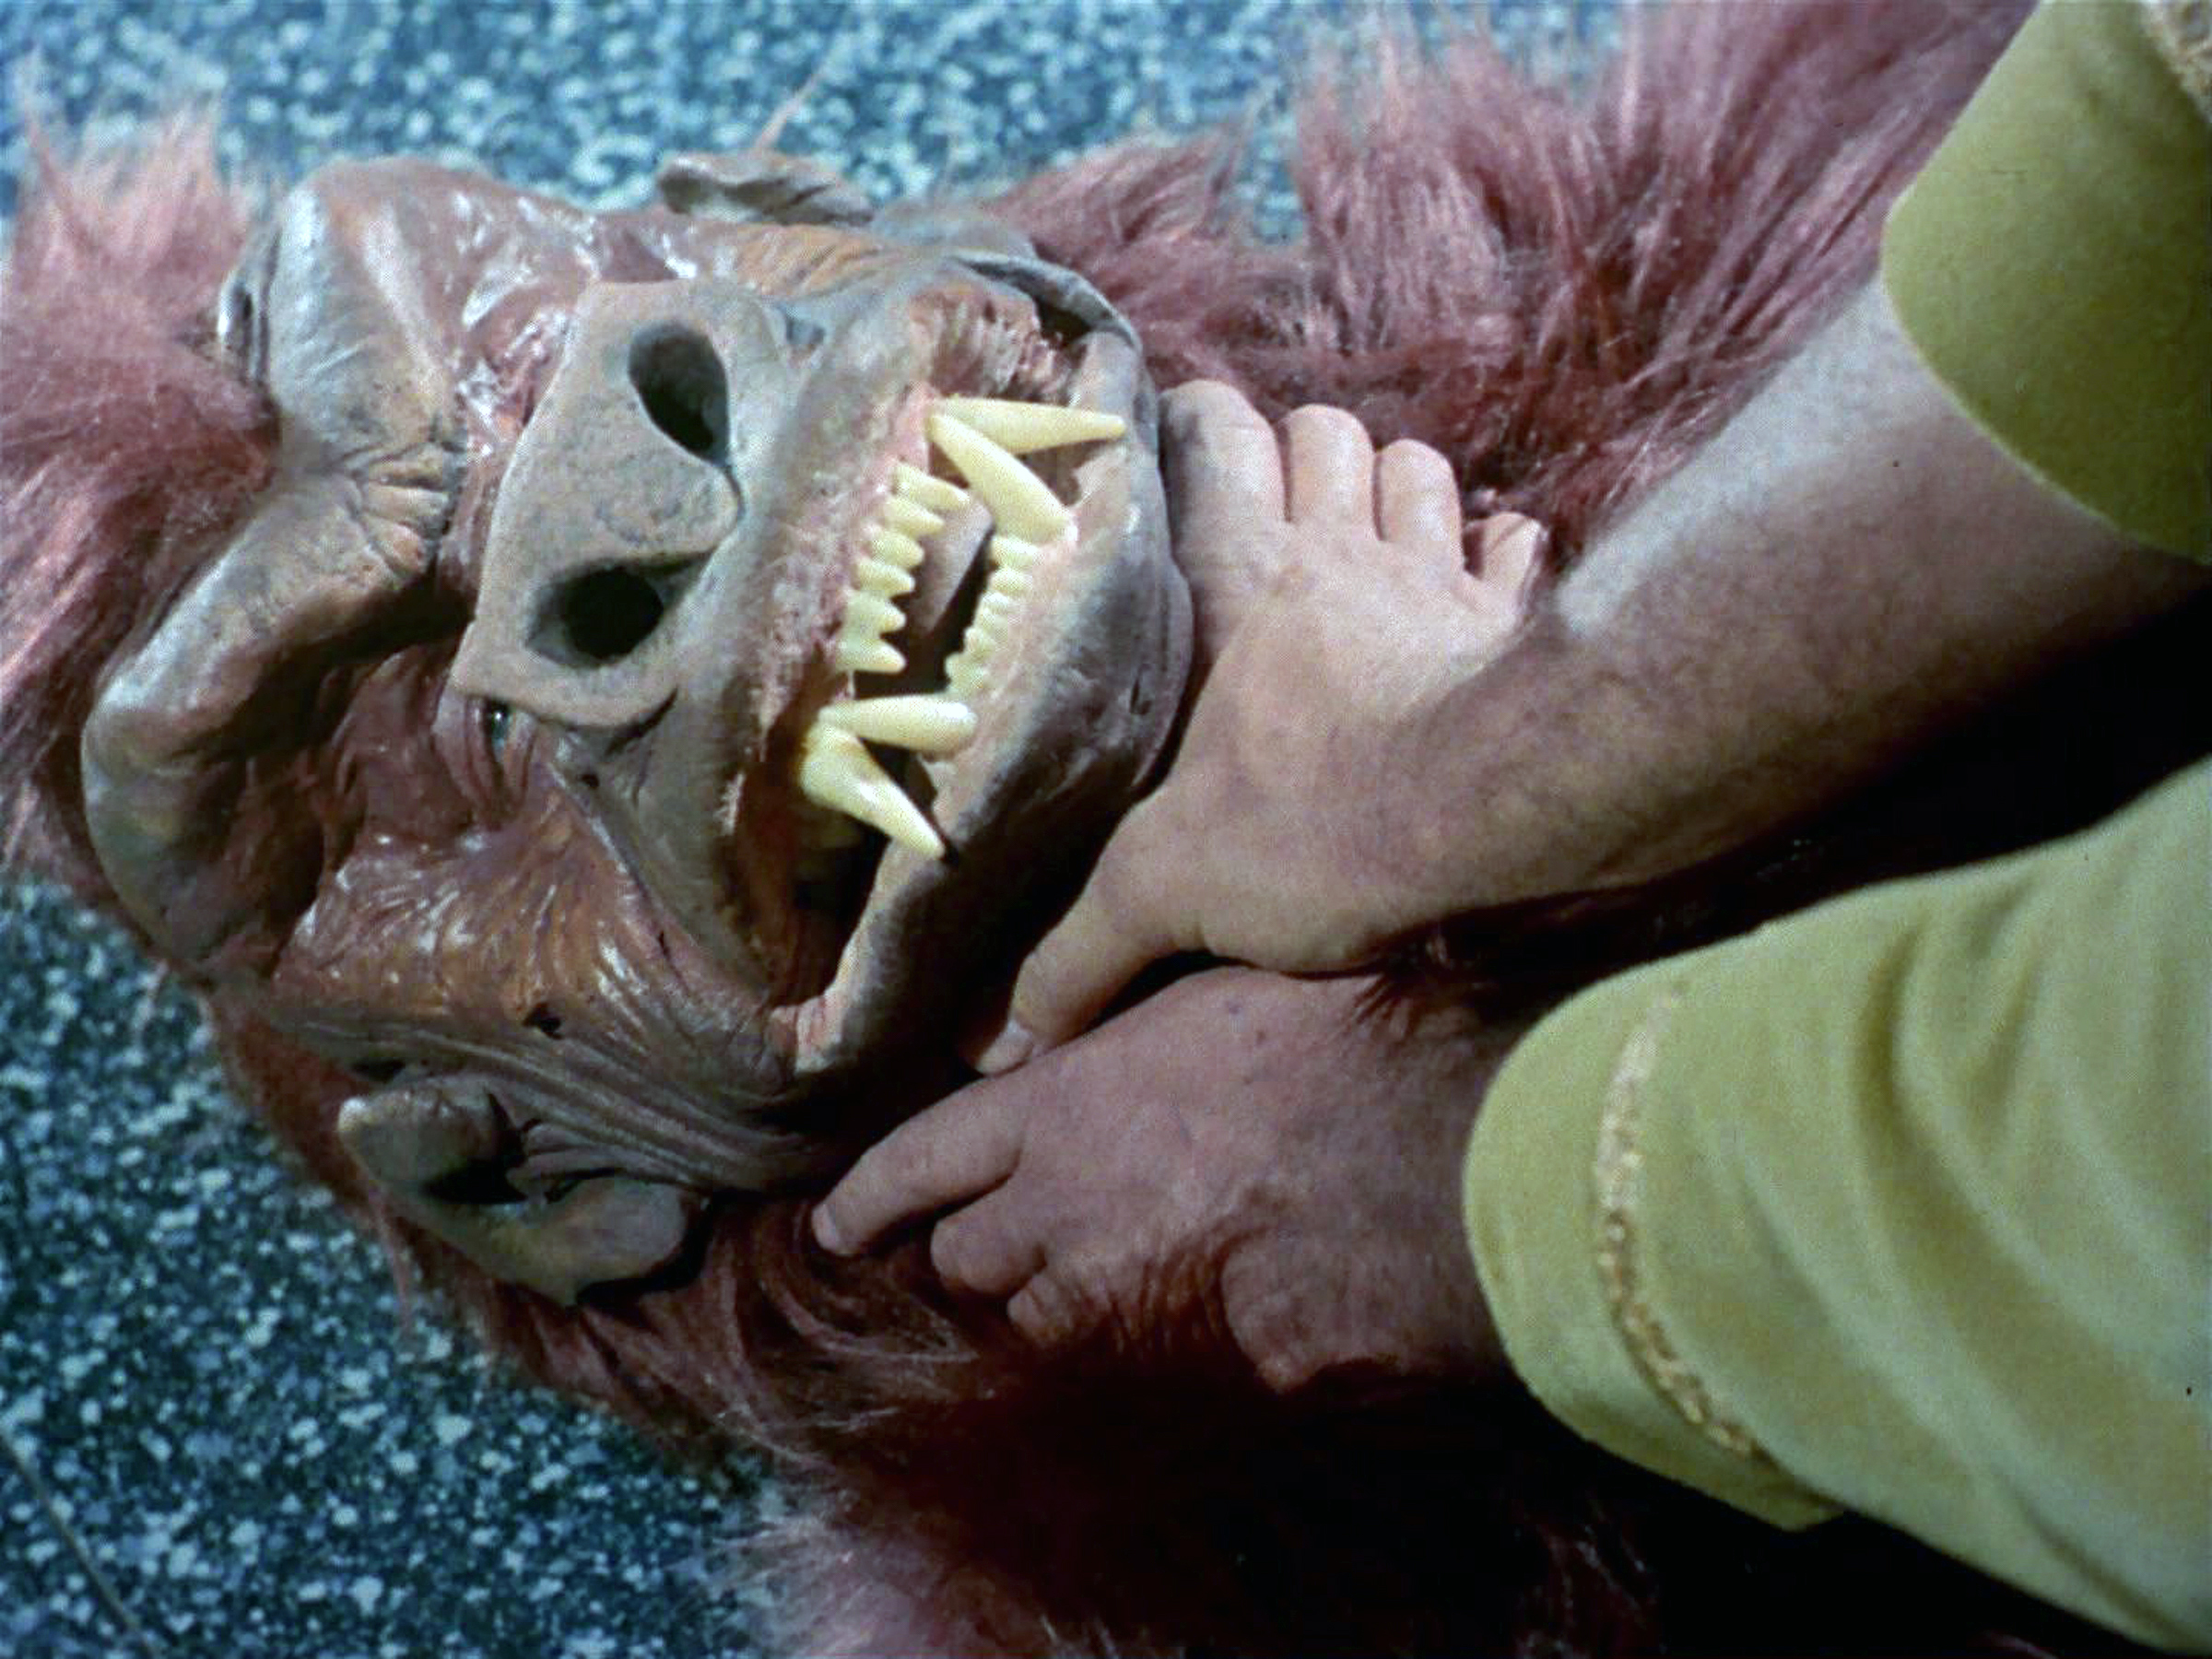 Janos Prohaska as the Anthropoid Ape.